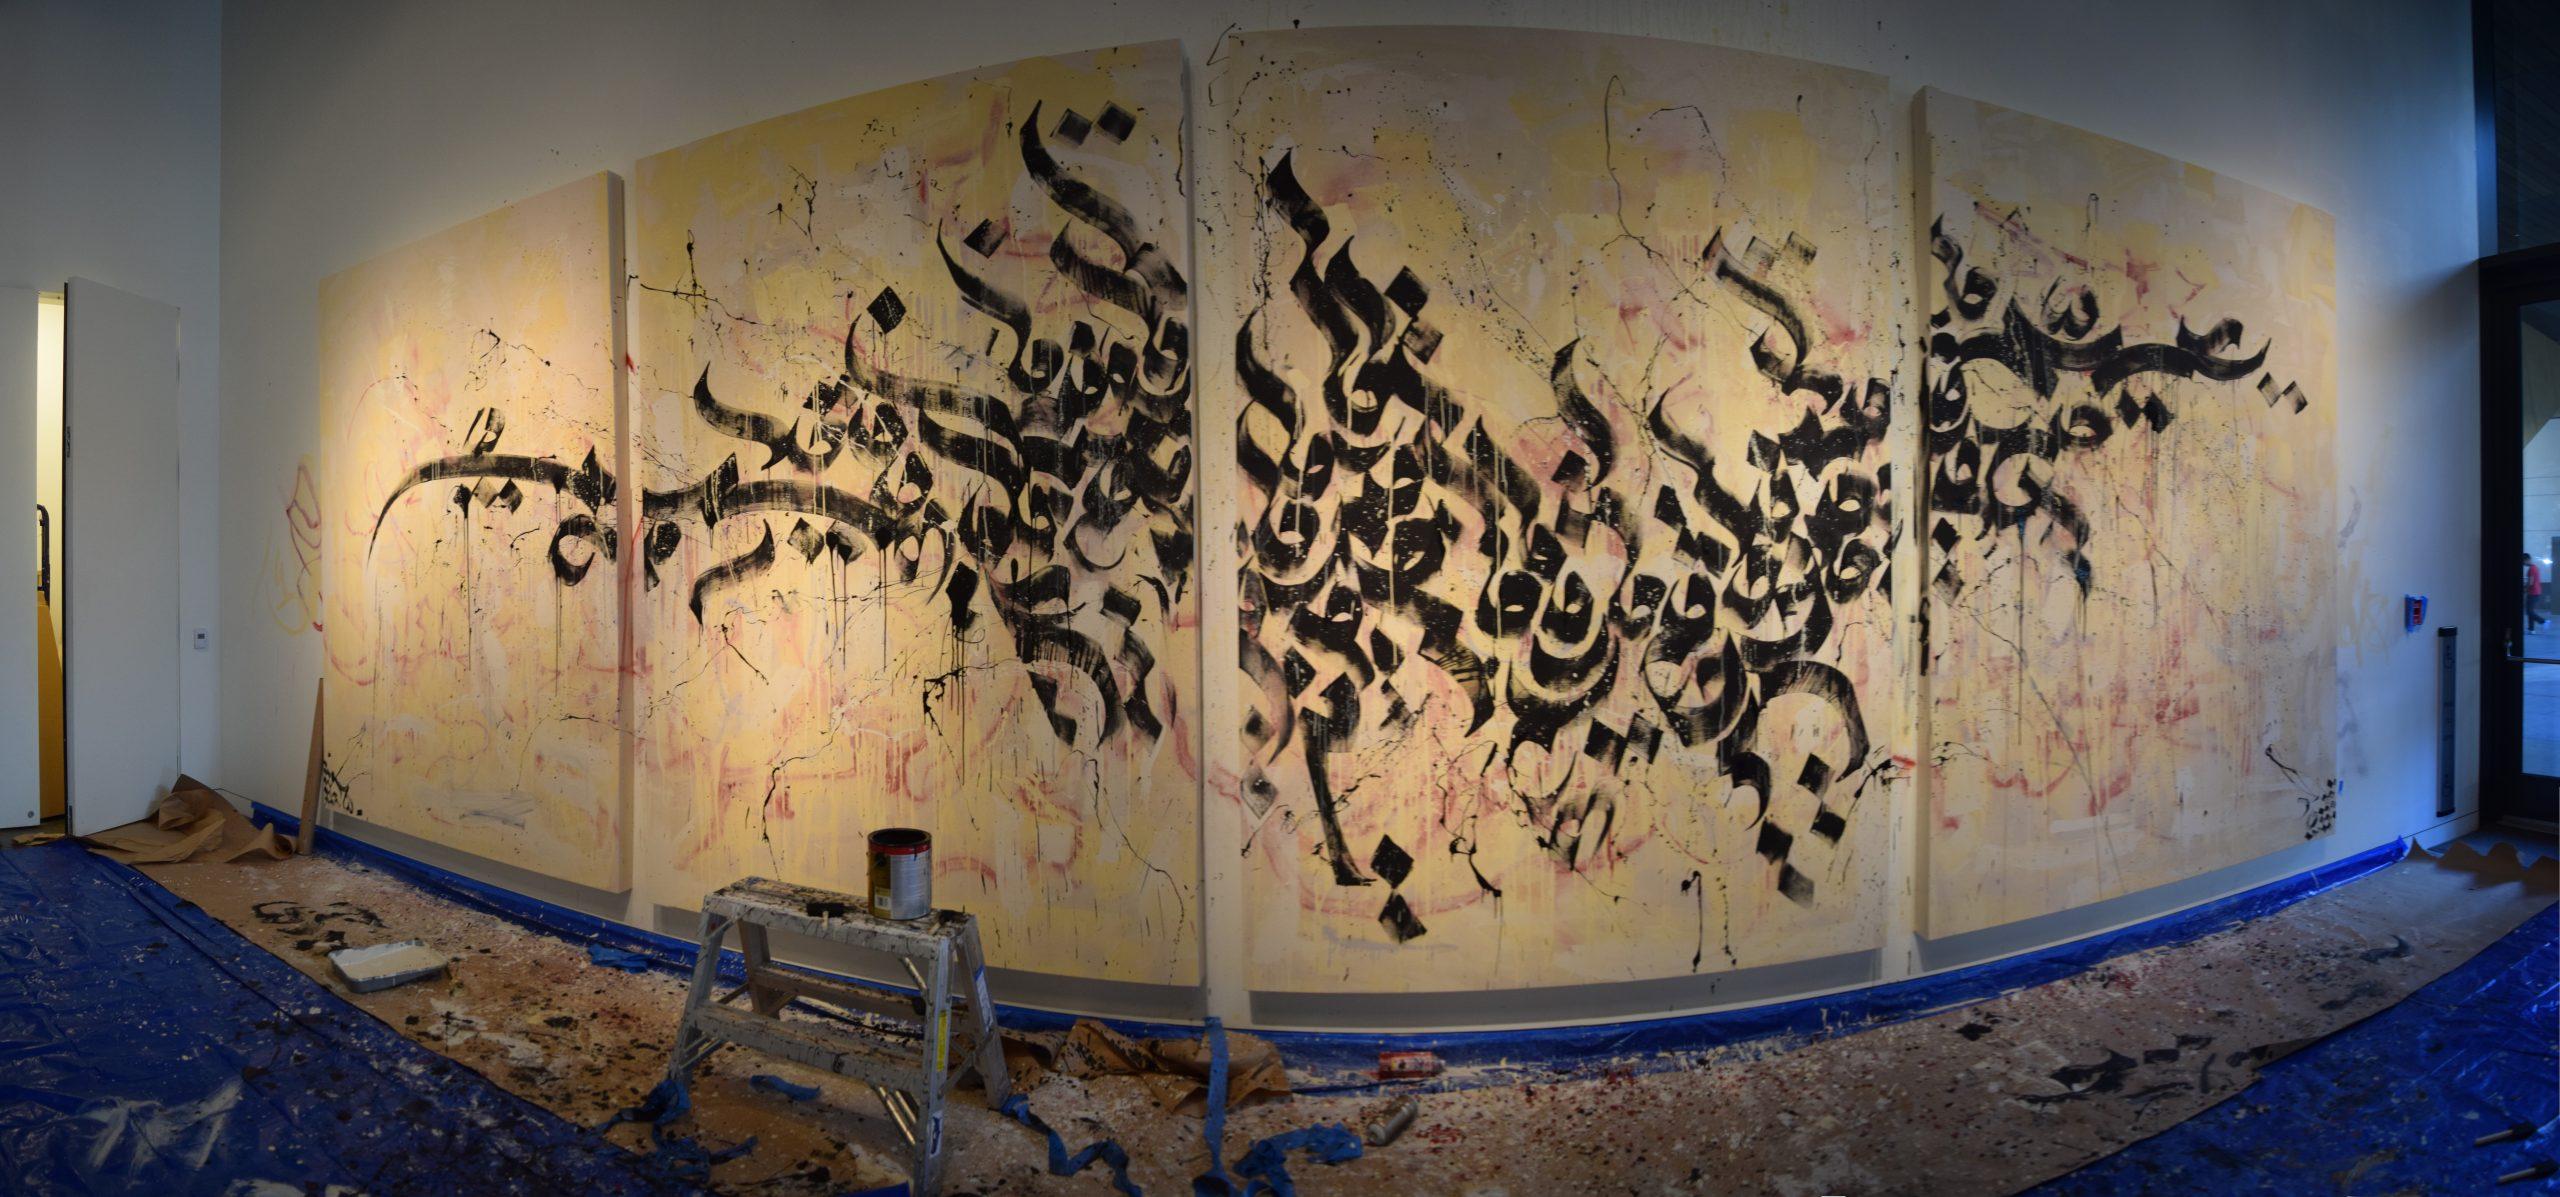 Ghalamdar, Untitled, acrylic and spray paint on raw canvas, 260 x 720 cm, 2016